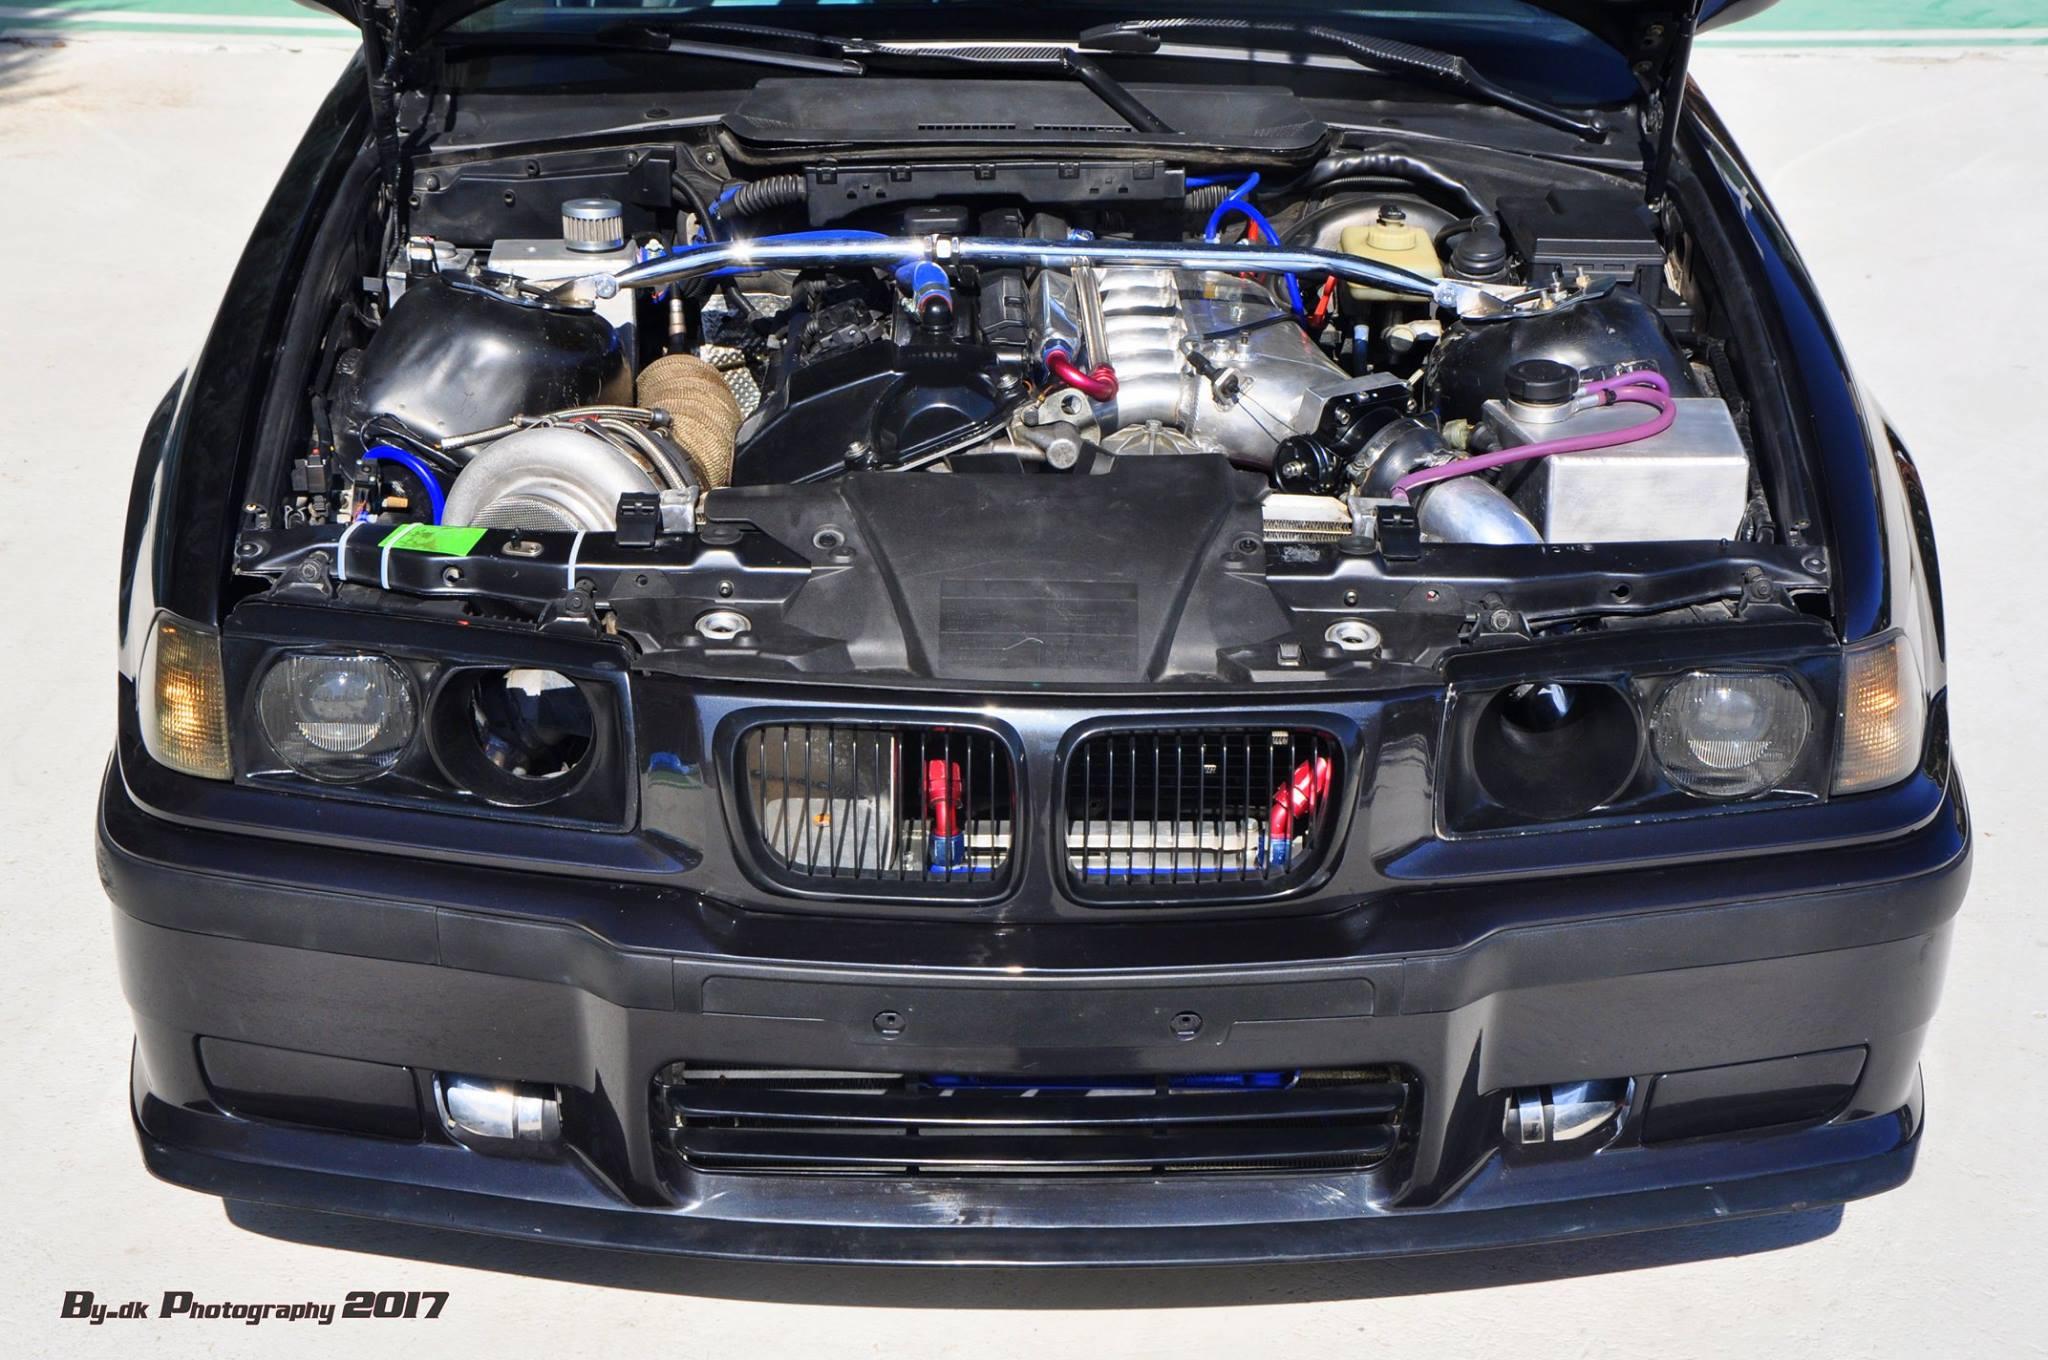 bmw e36 turbo kit - technica motorsports bmw e36 turbo kit, bmw